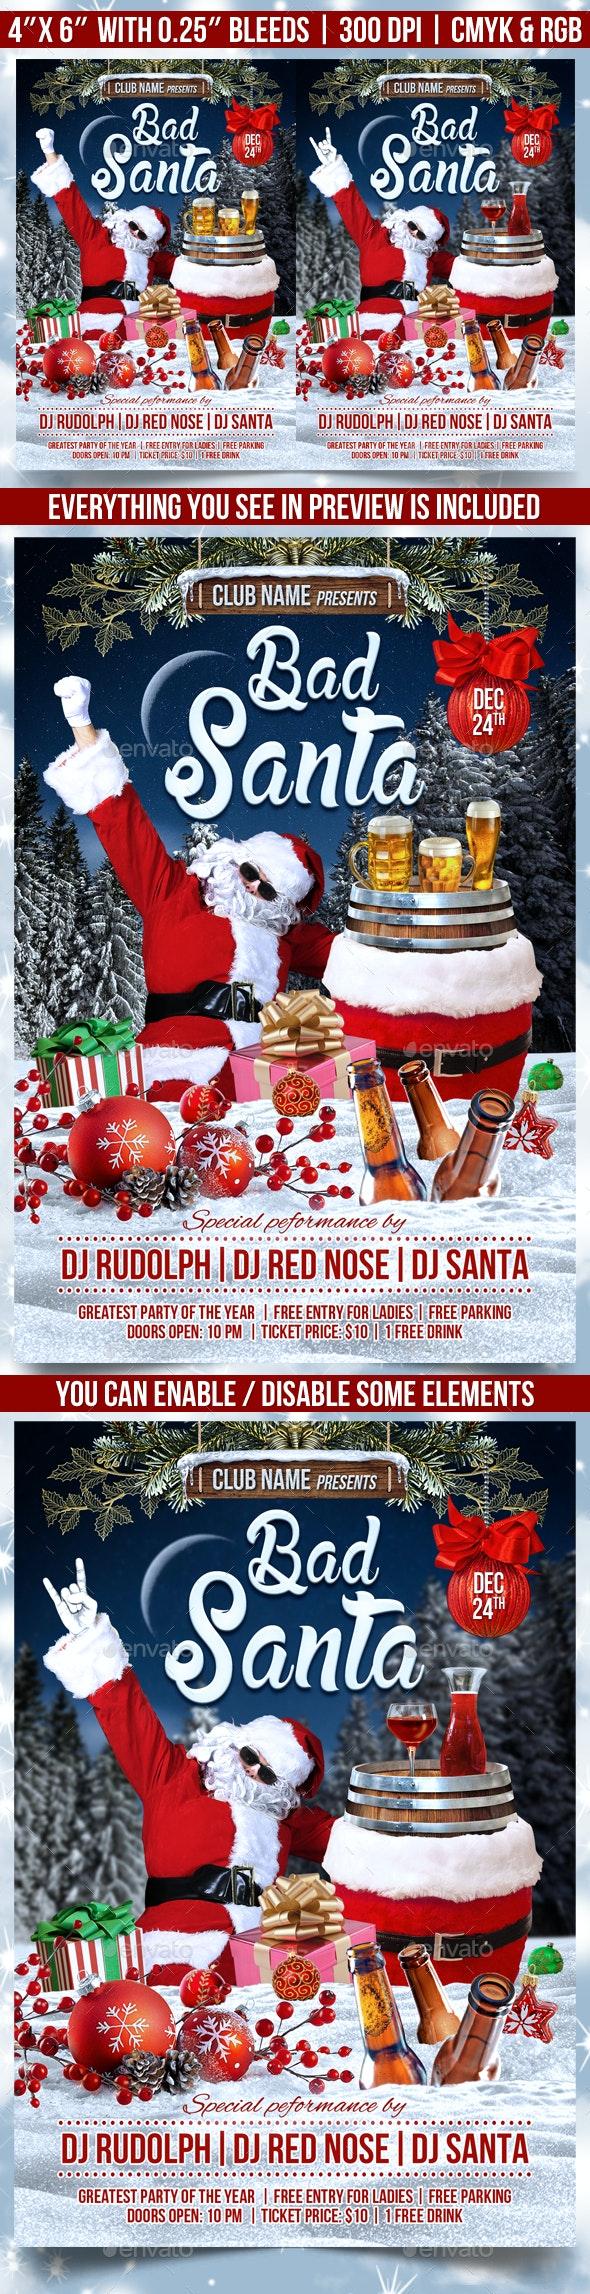 Bad Santa Flyer Template - Events Flyers